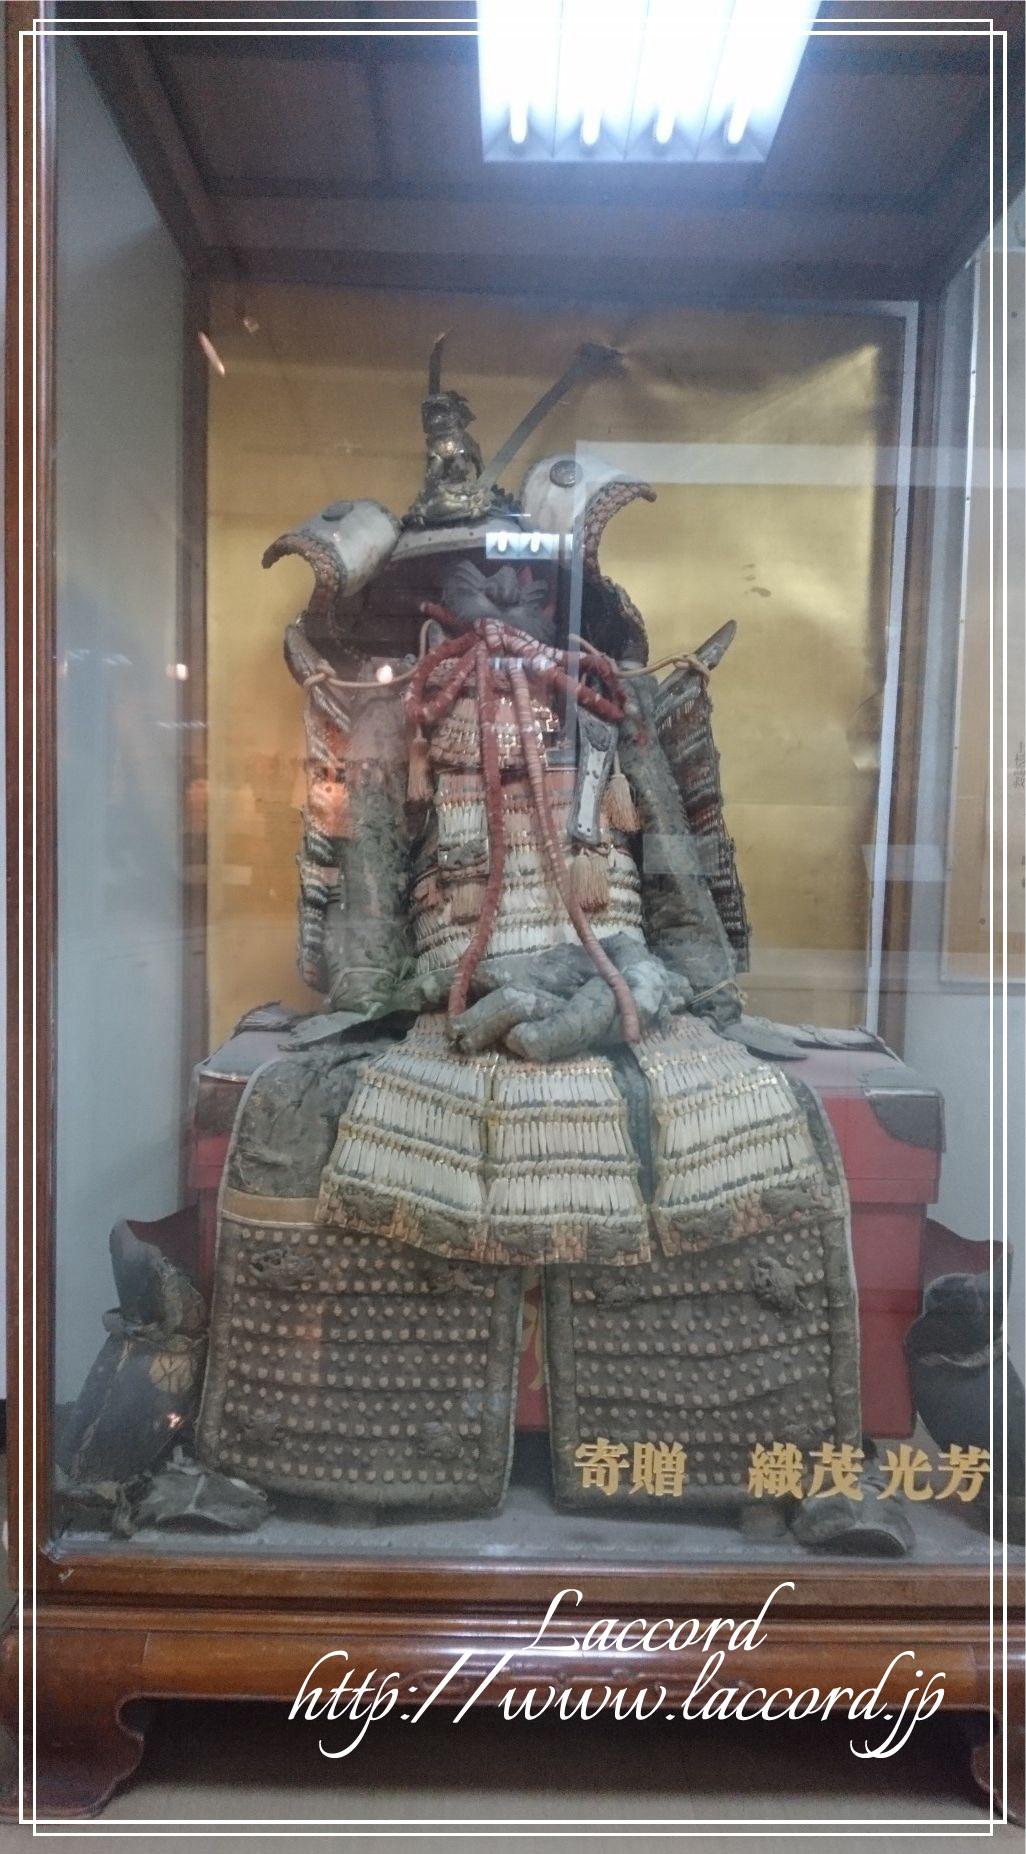 横須賀衣笠で。_f0275956_12190170.jpg